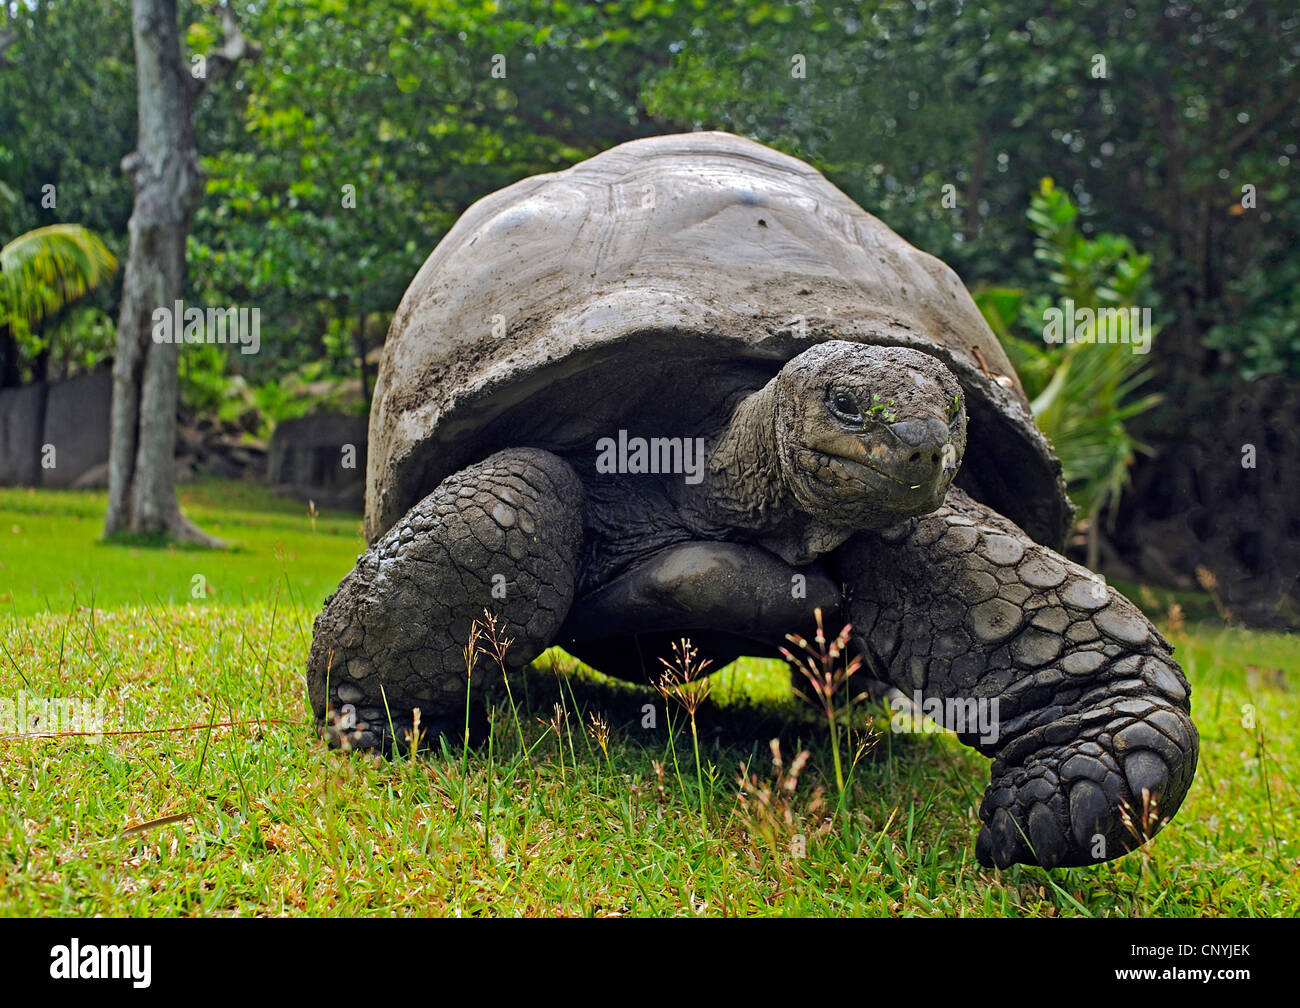 Seychelles tartaruga gigante, Aldabran tartaruga gigante, tartaruga gigante di Aldabra (Aldabrachelys gigantea, Testudo, gigantea Geochelone gigantea, Megalochelys gigantea), passeggiate in un prato, Seychelles, La Digue Foto Stock